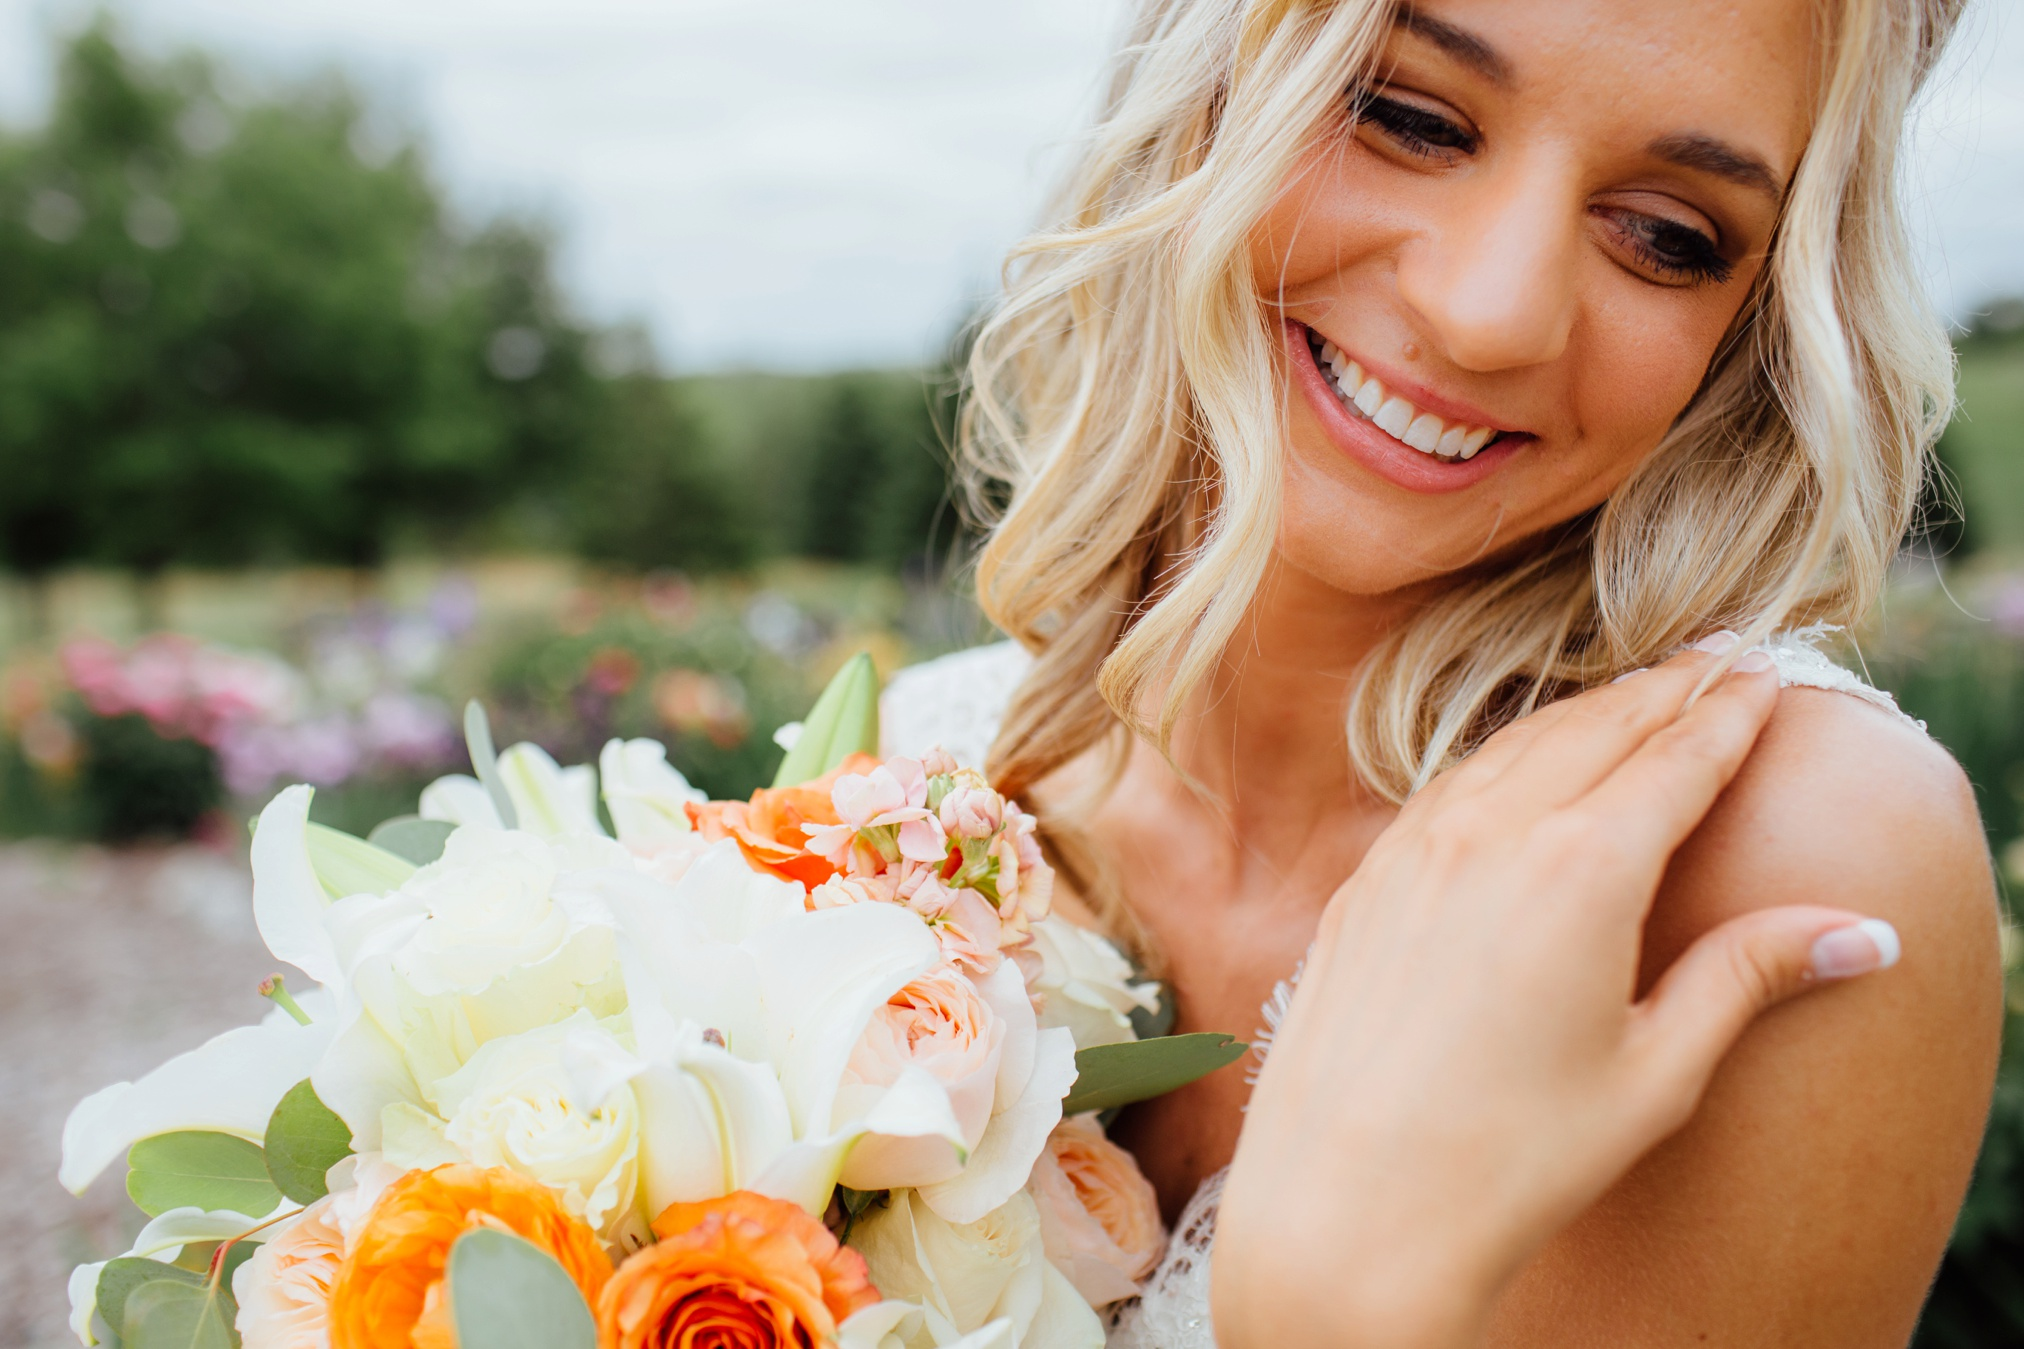 schmid_wedding-122.jpg